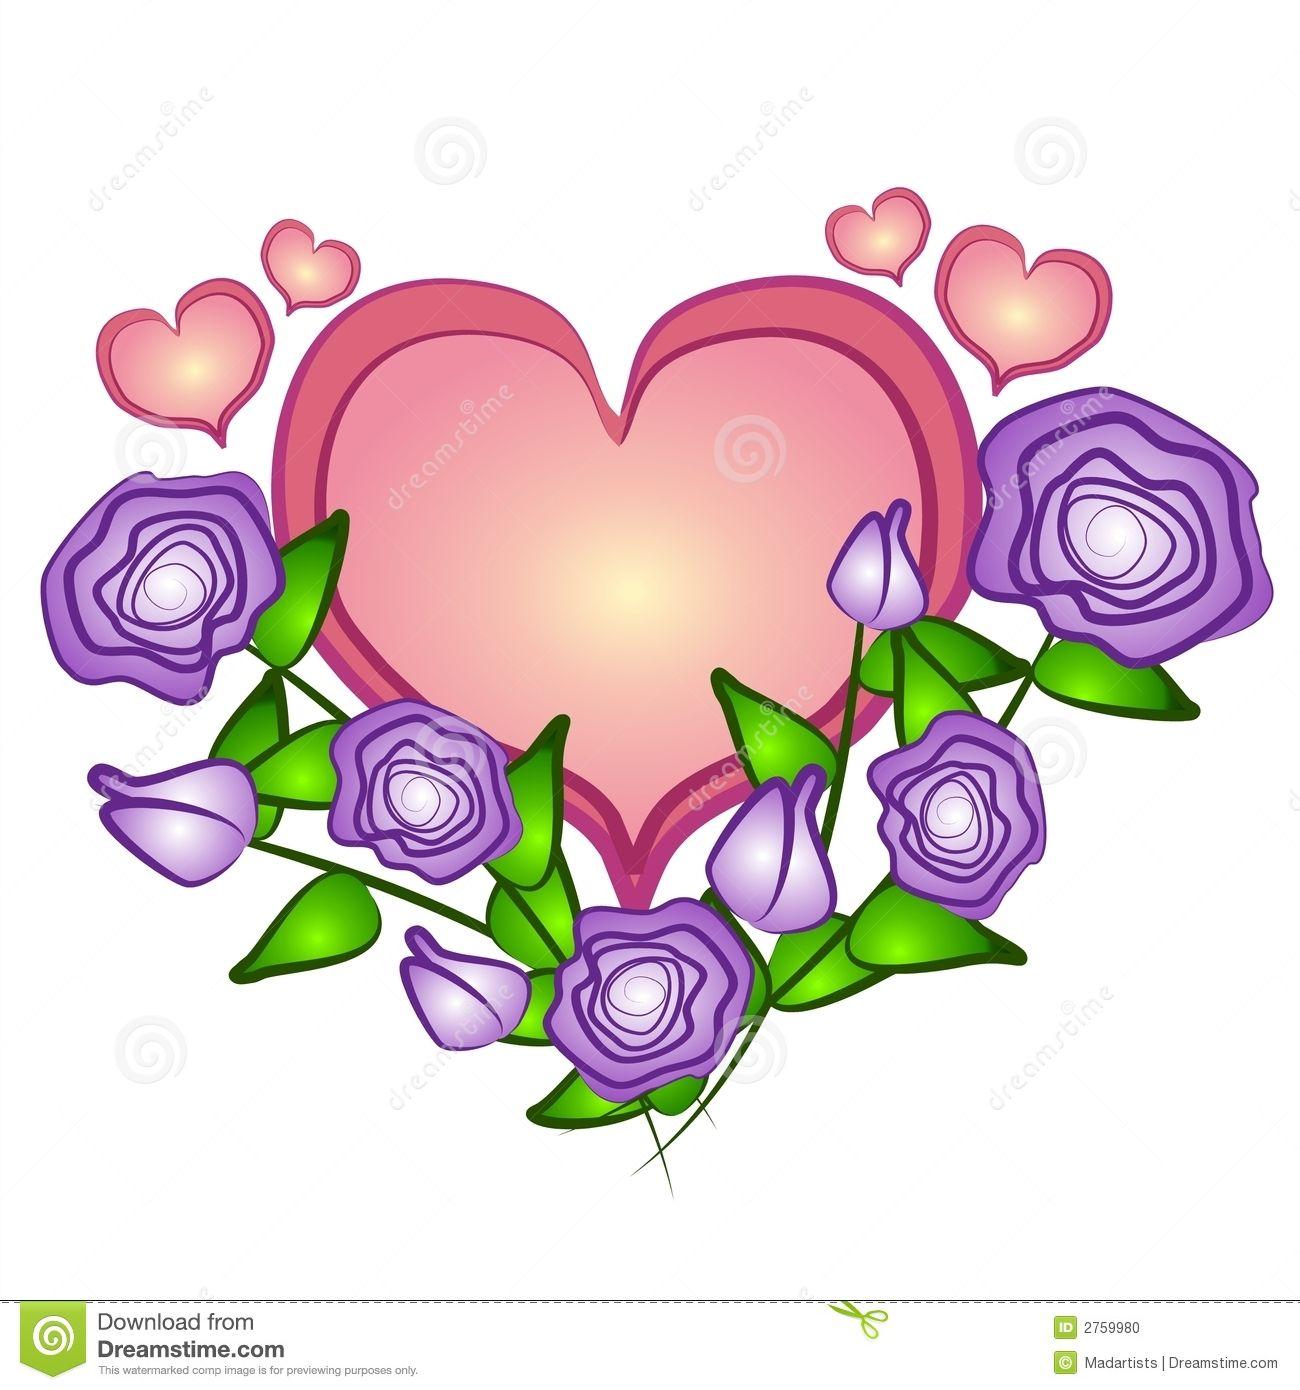 mother's day flower clip art